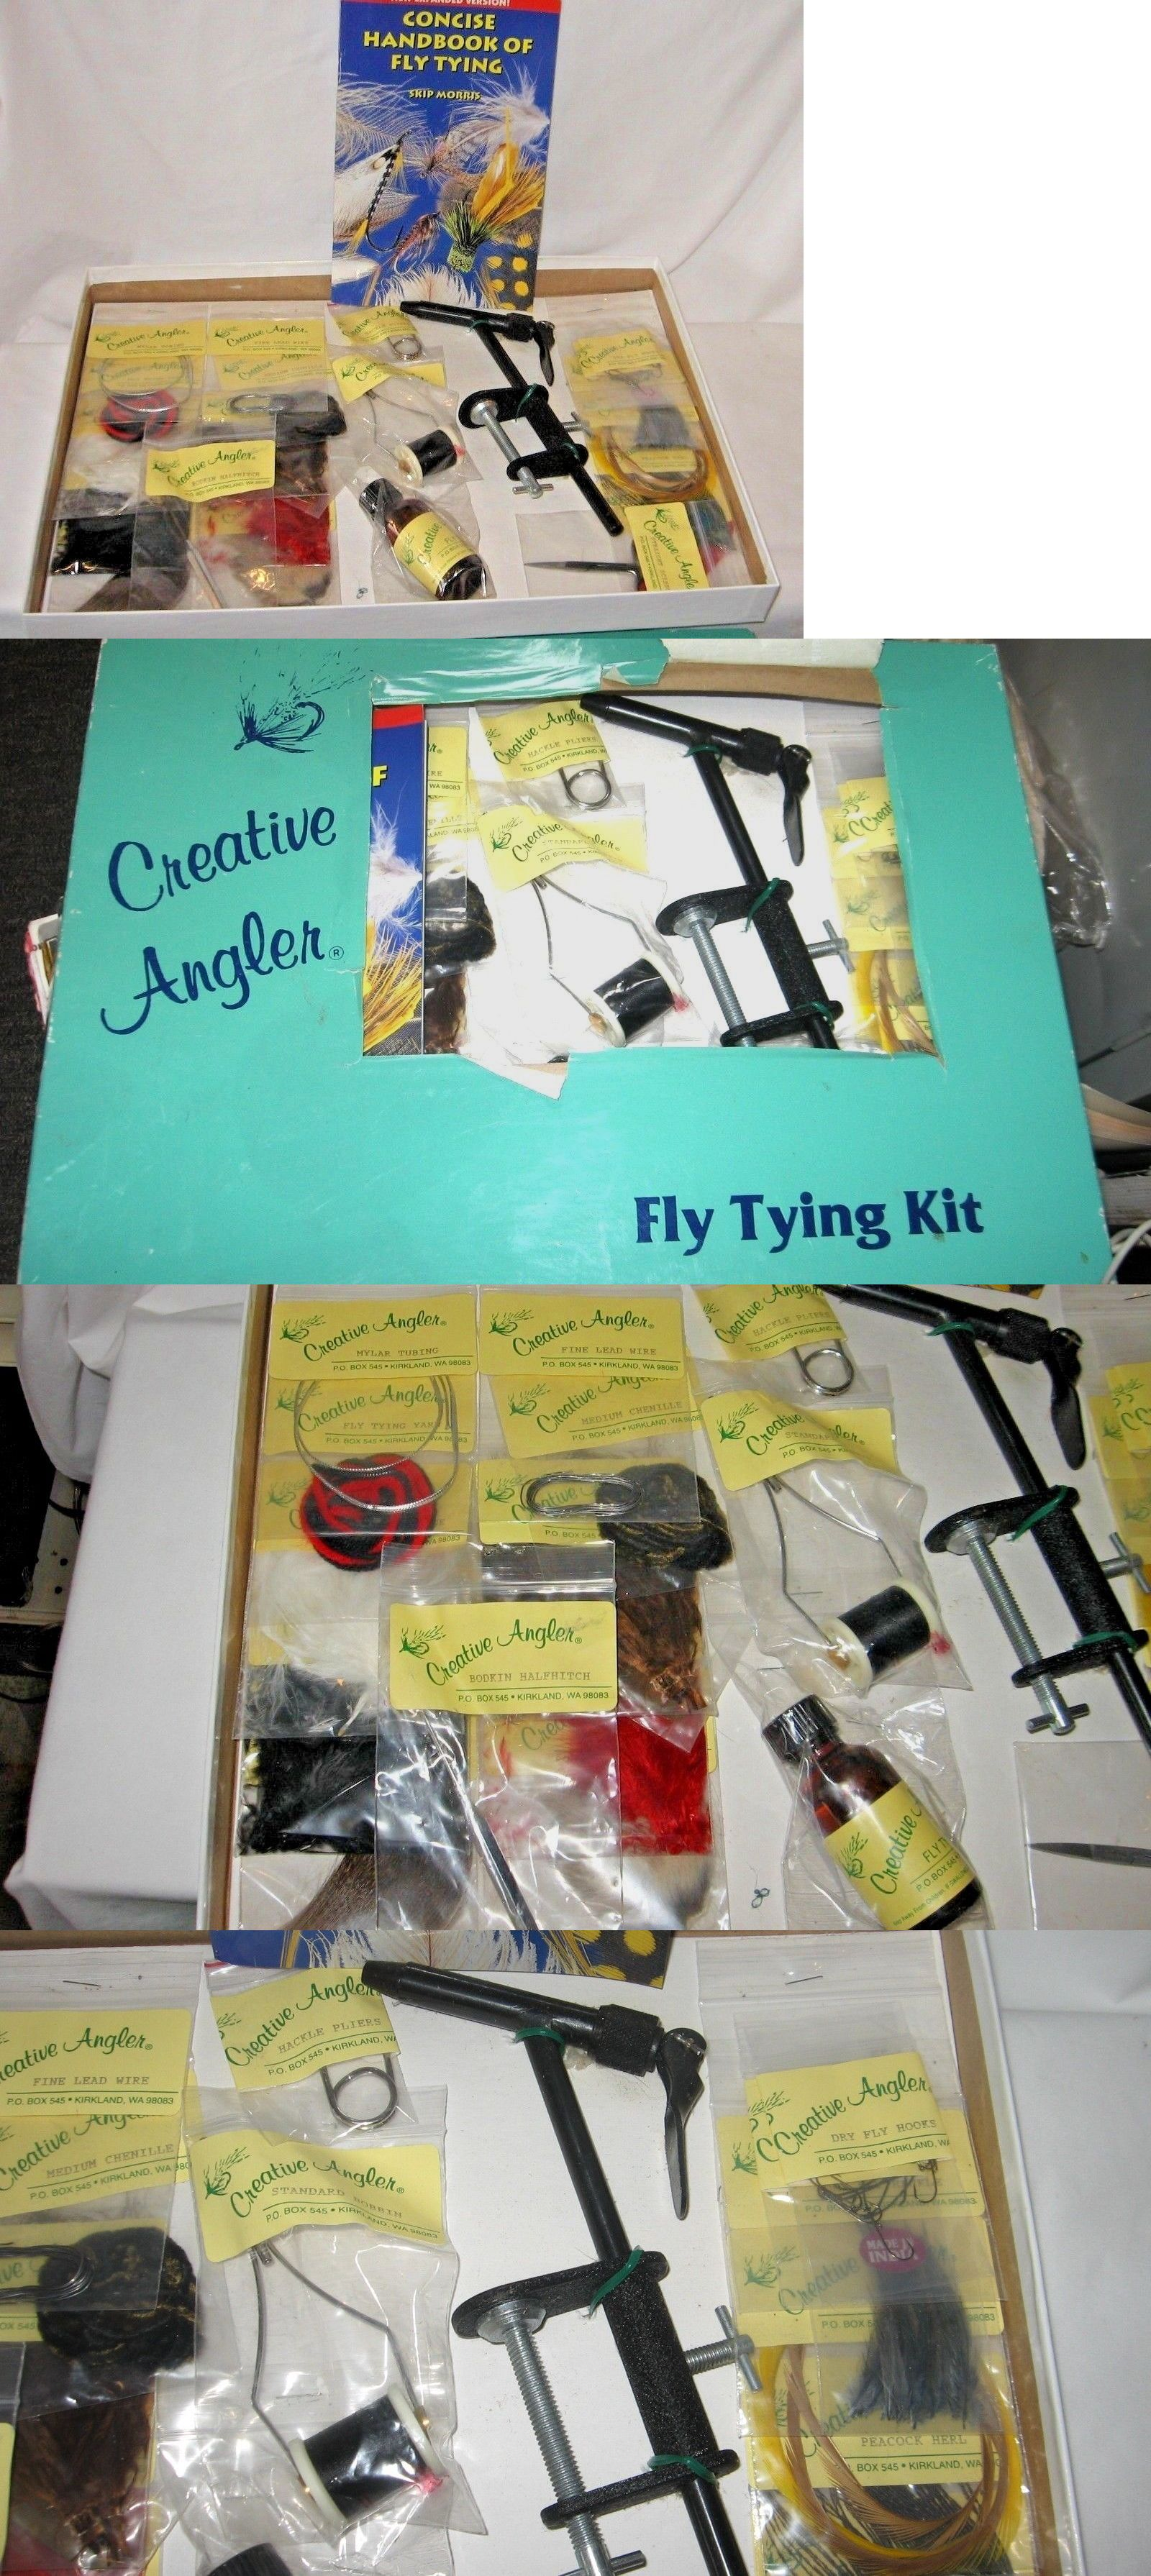 Angelsport-Köder, -Futtermittel & -Fliegen Angelsport-Fliegen-Bindematerialien Umpqua Fly Fishing Deluxe Fly Tying Kit